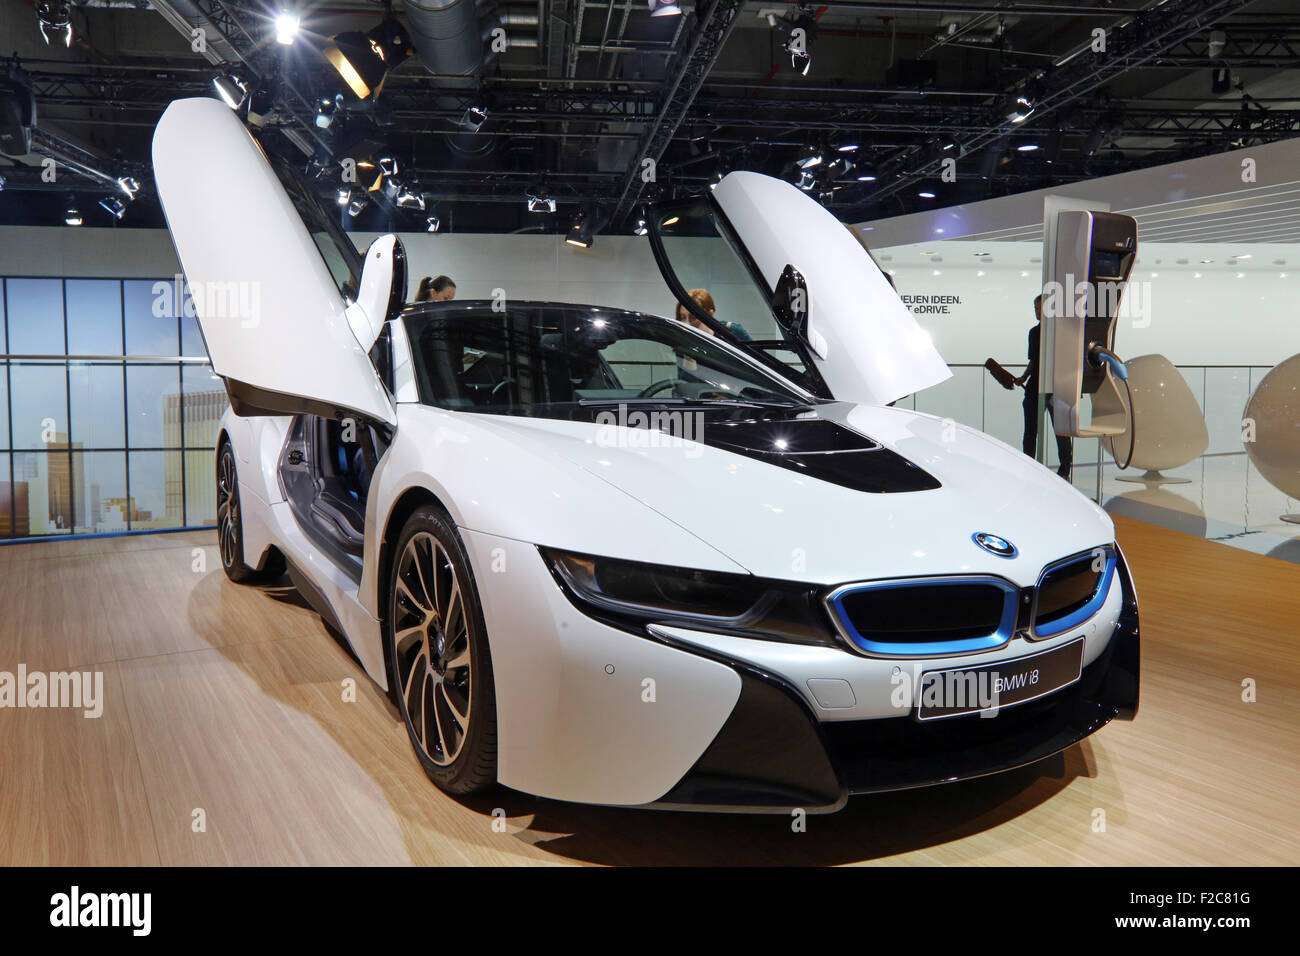 Frankfurt/M, 16.09.2015 - concept car híbrido BMW i8 en el stand de BMW en el 66º Salón Internacional Imagen De Stock